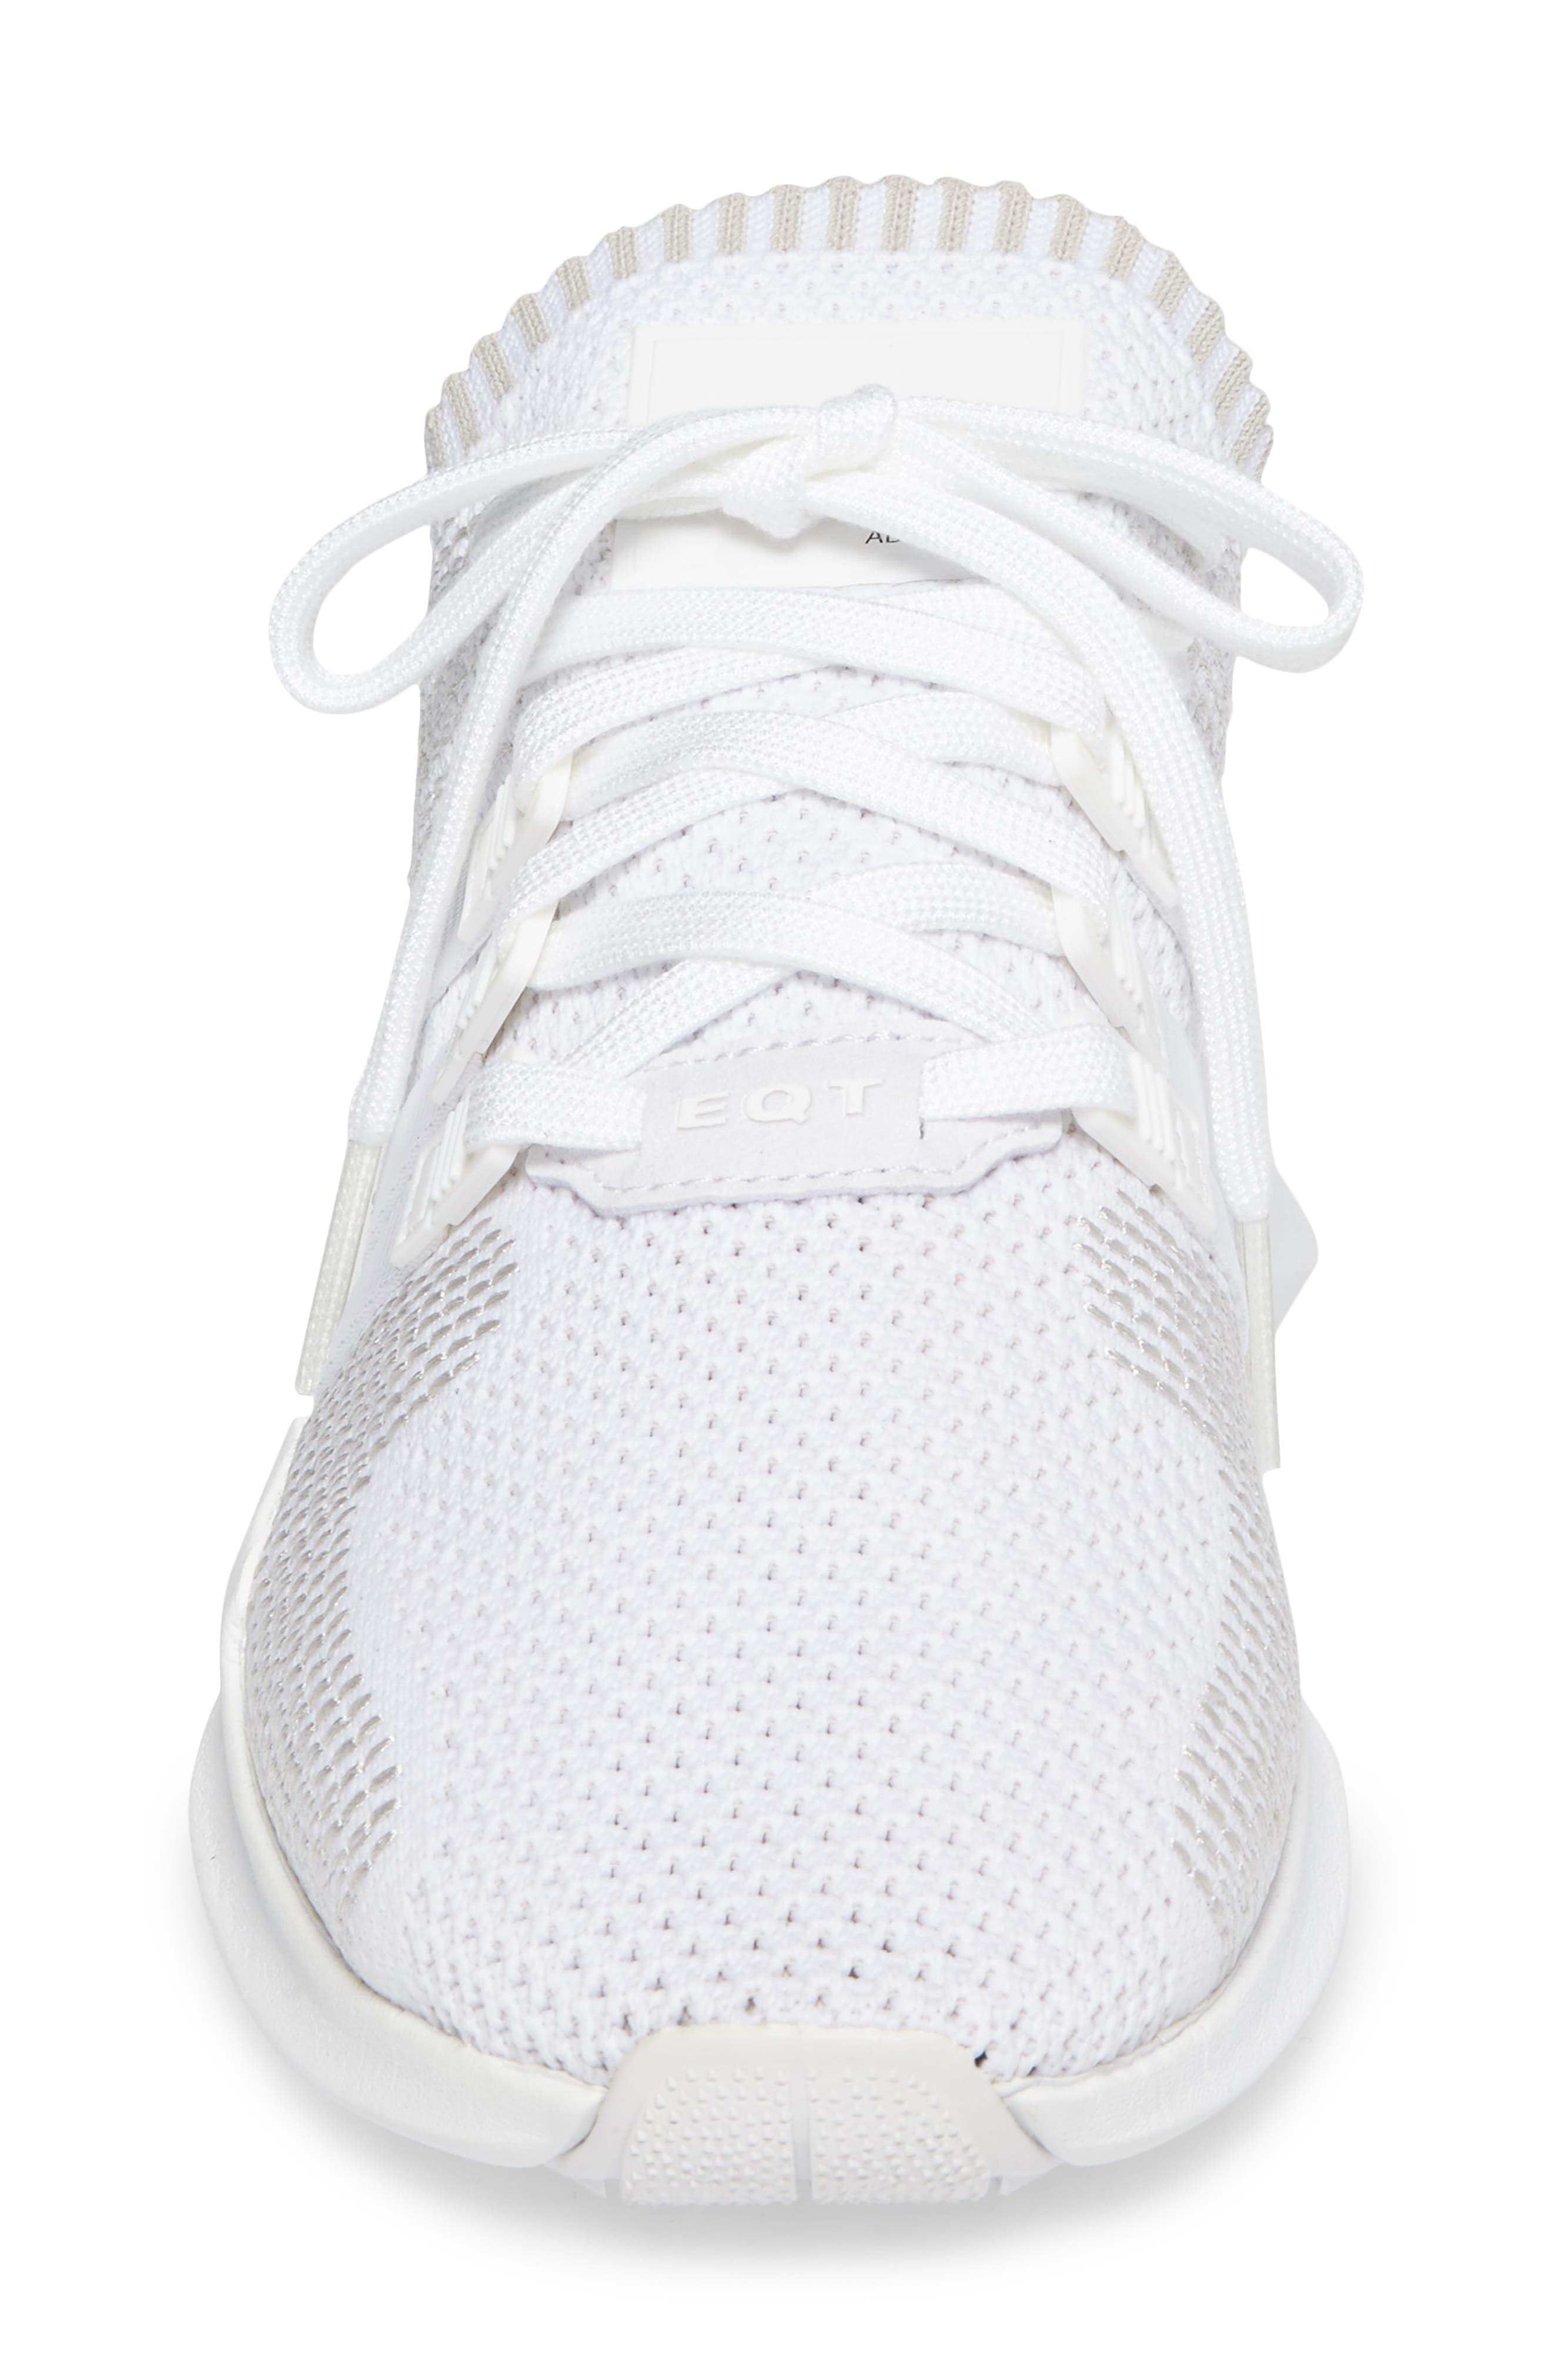 EQT Support ADV PrimeKnit Sneaker,                             Alternate thumbnail 4, color,                             White/ White/ Sub Green